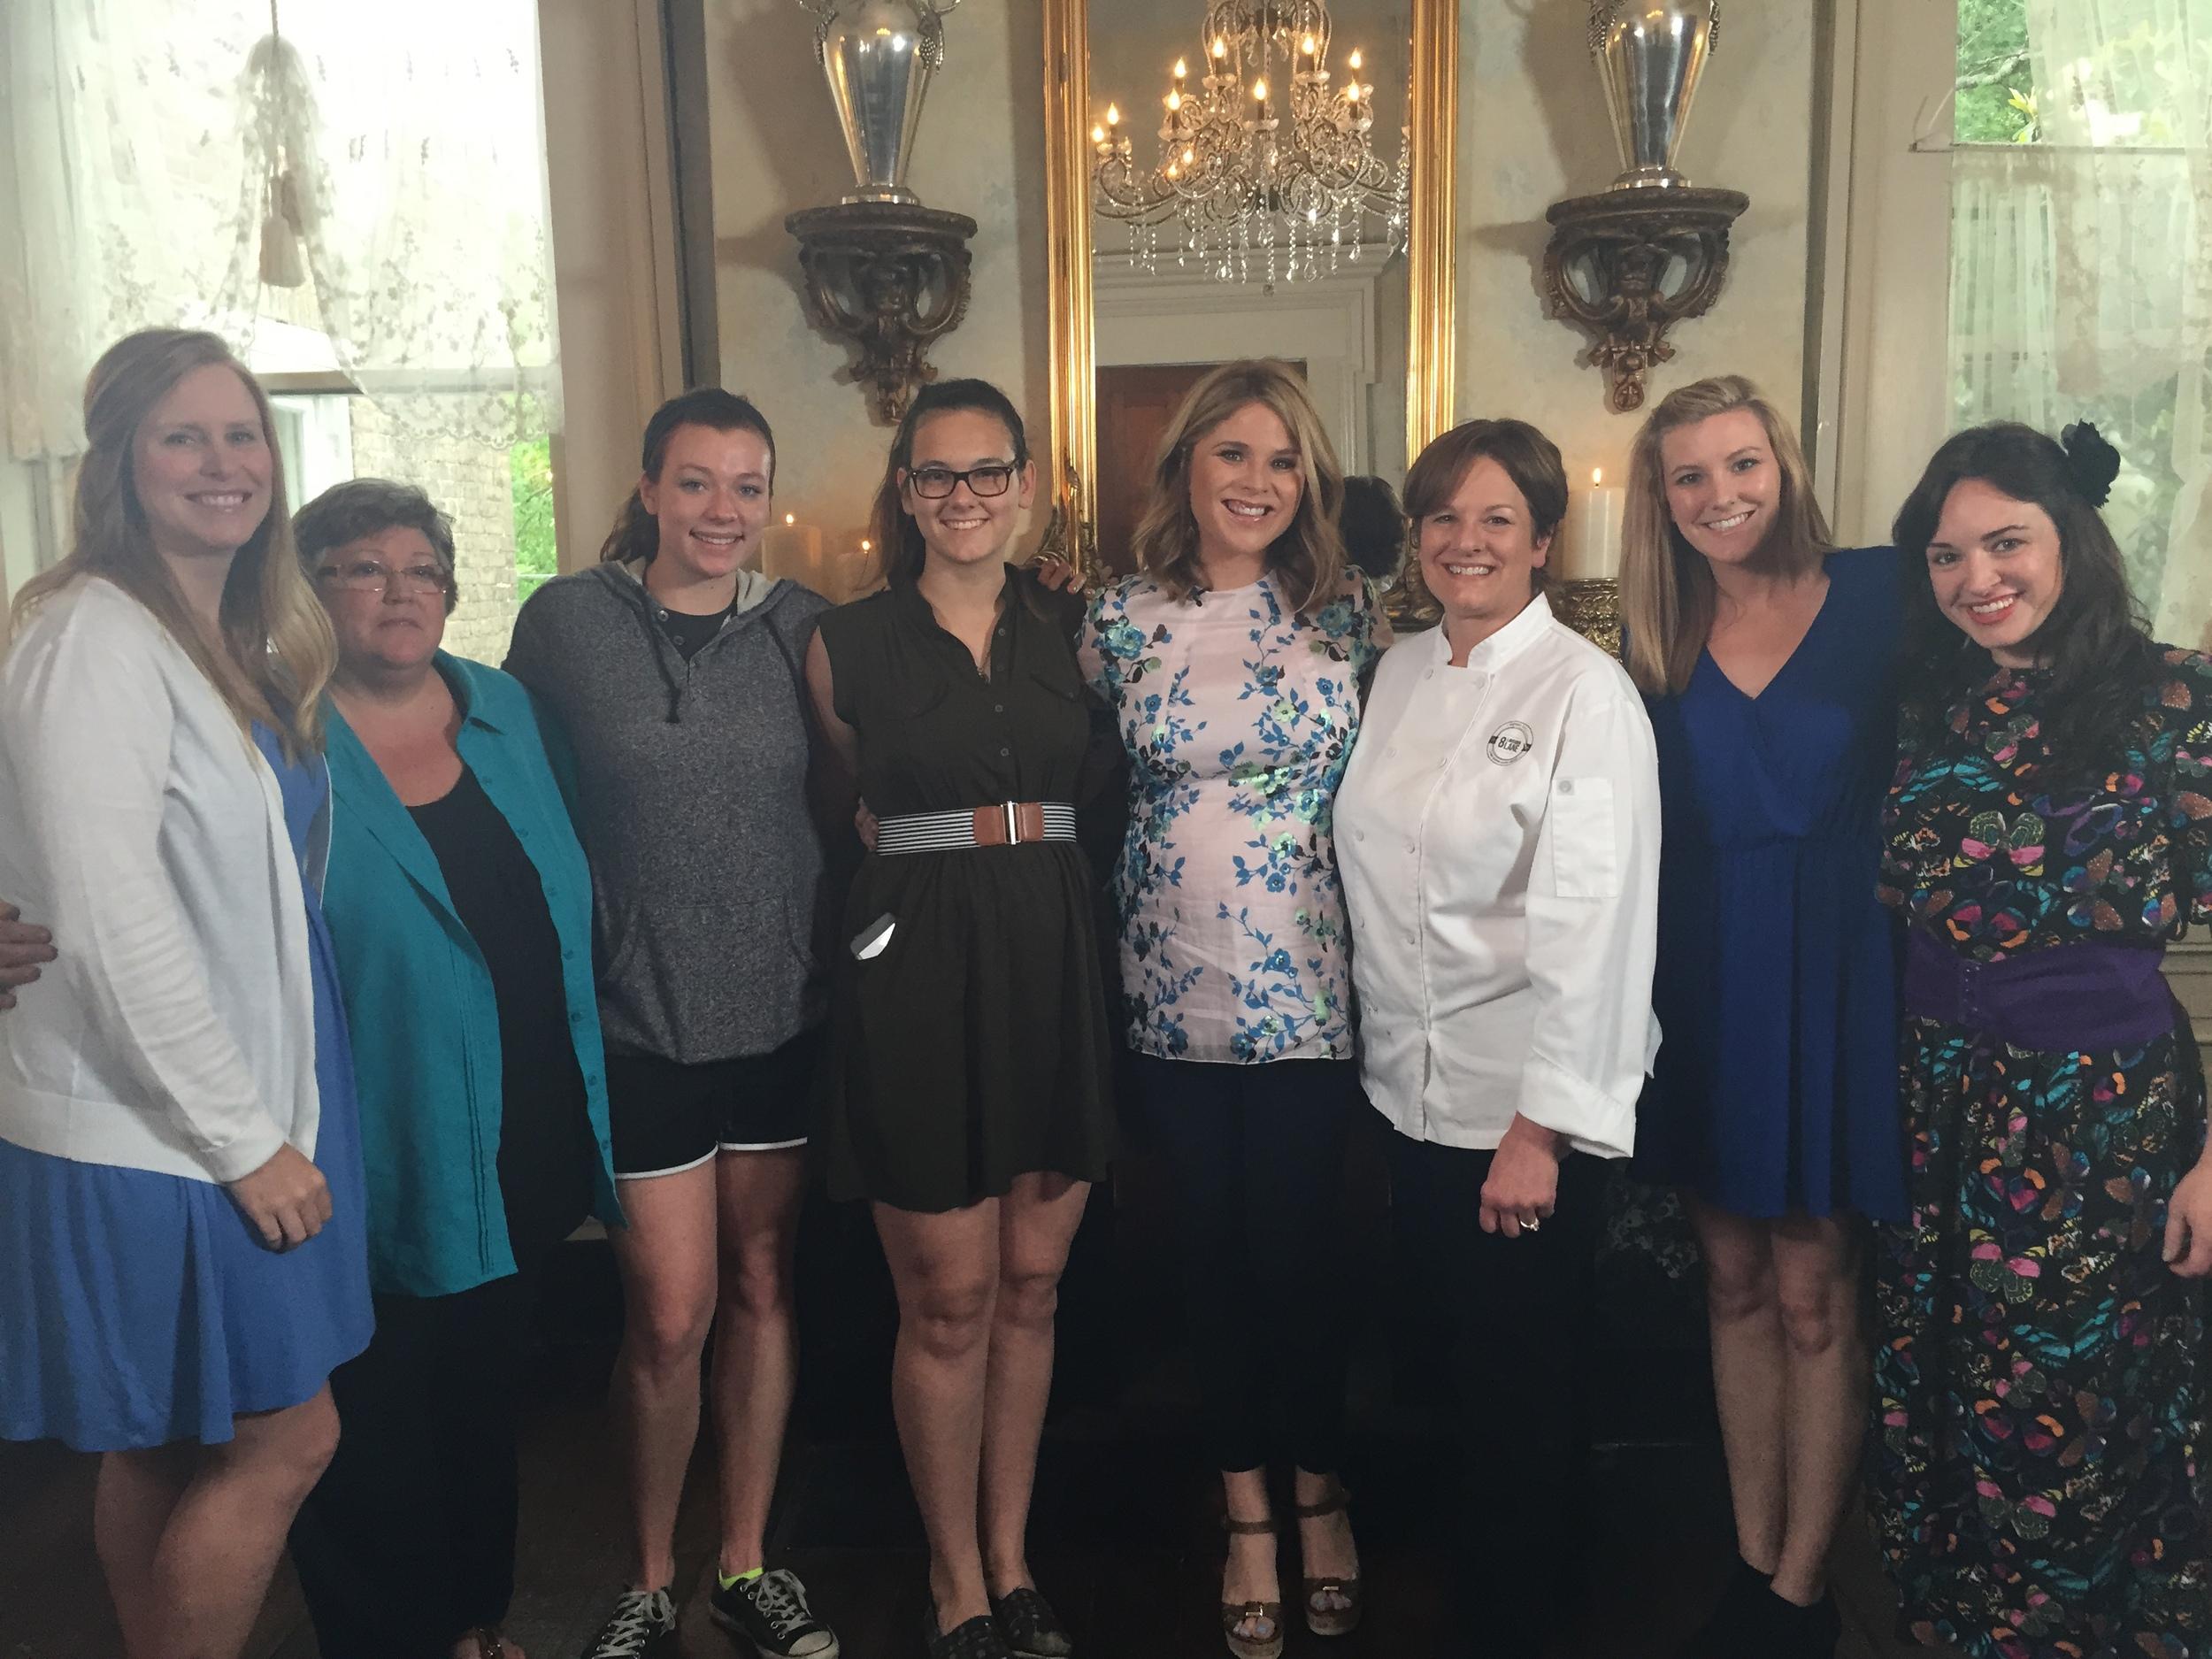 Staff with Jenna Bush Hager